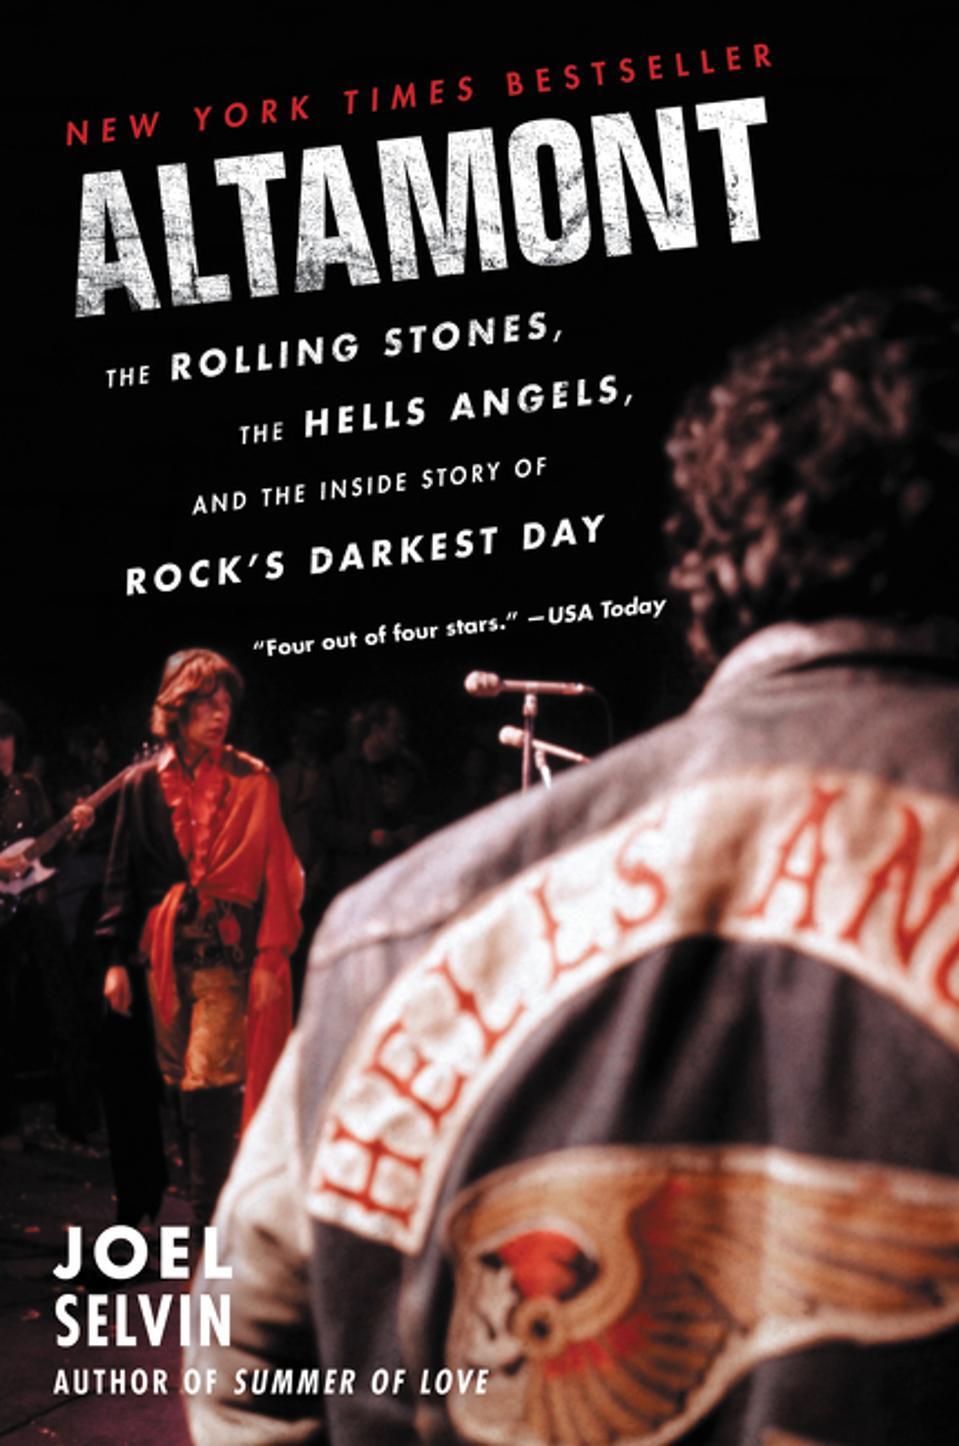 Book jacket of Altamont, by Joel Selvin